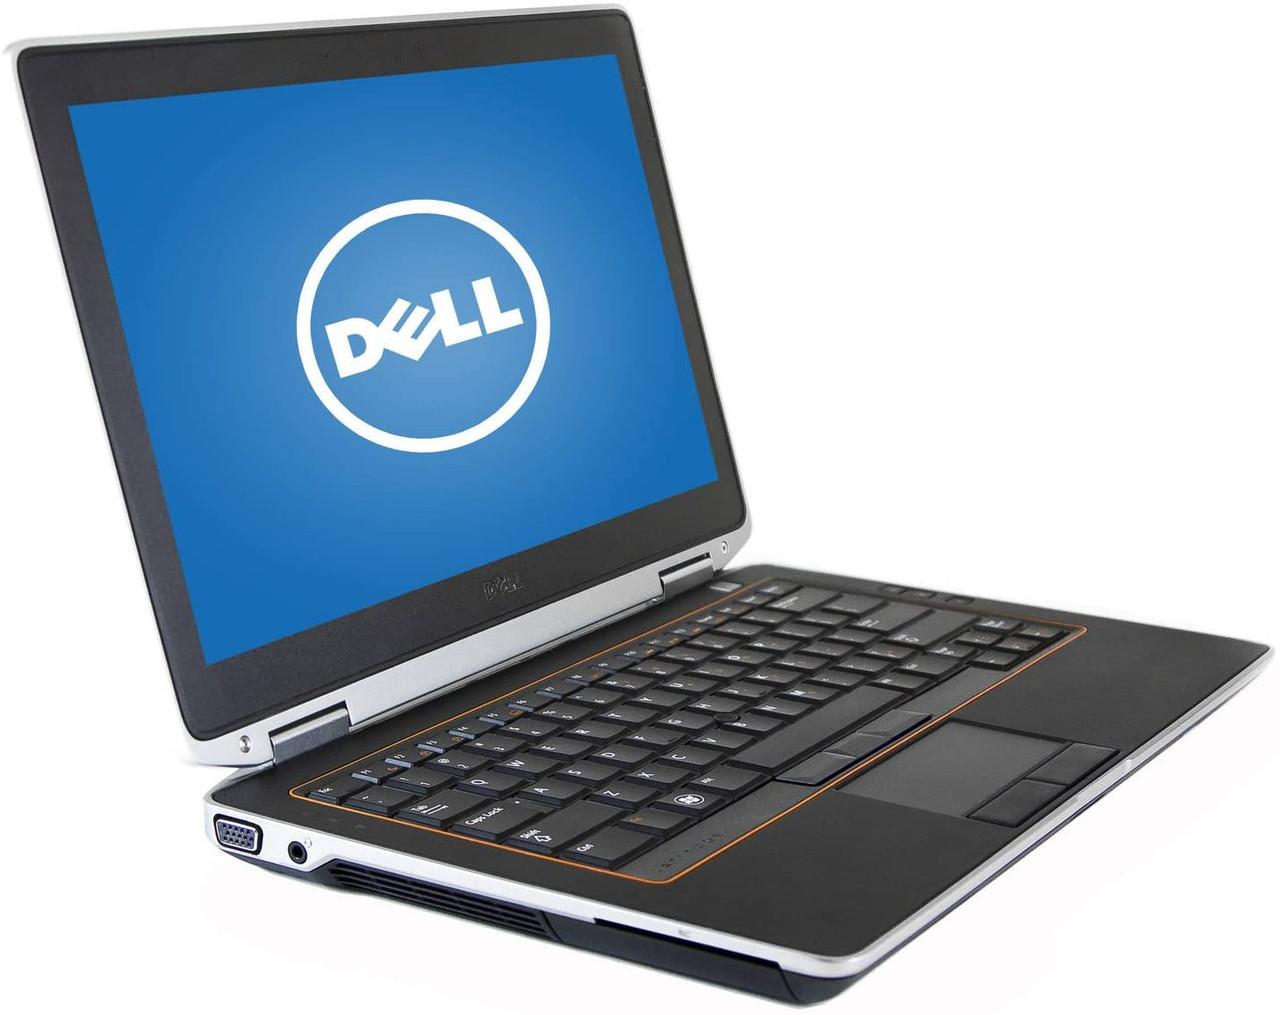 old-Dell Latitude E6320 Laptop Core i5 2.5GHz, 4GB Ram, 250GB HDD, DVD-RW, Windows 10 Pro 64 Notebook